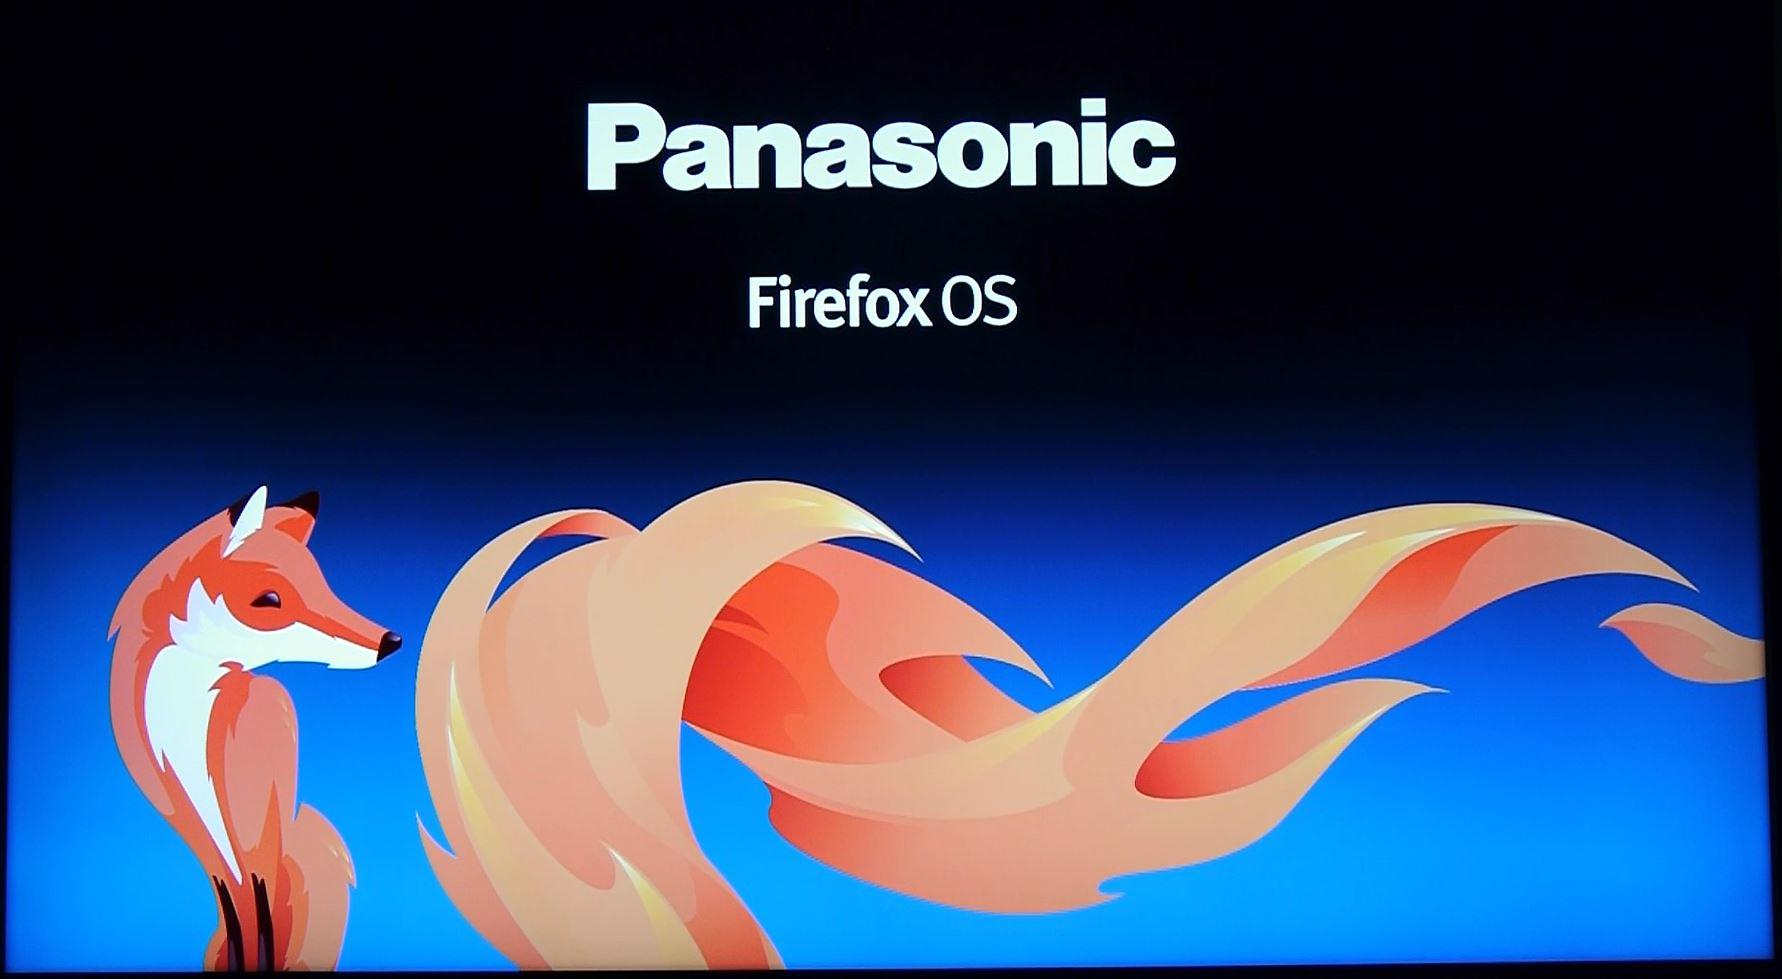 Nuevos televisores Panasonic con Firefox OS